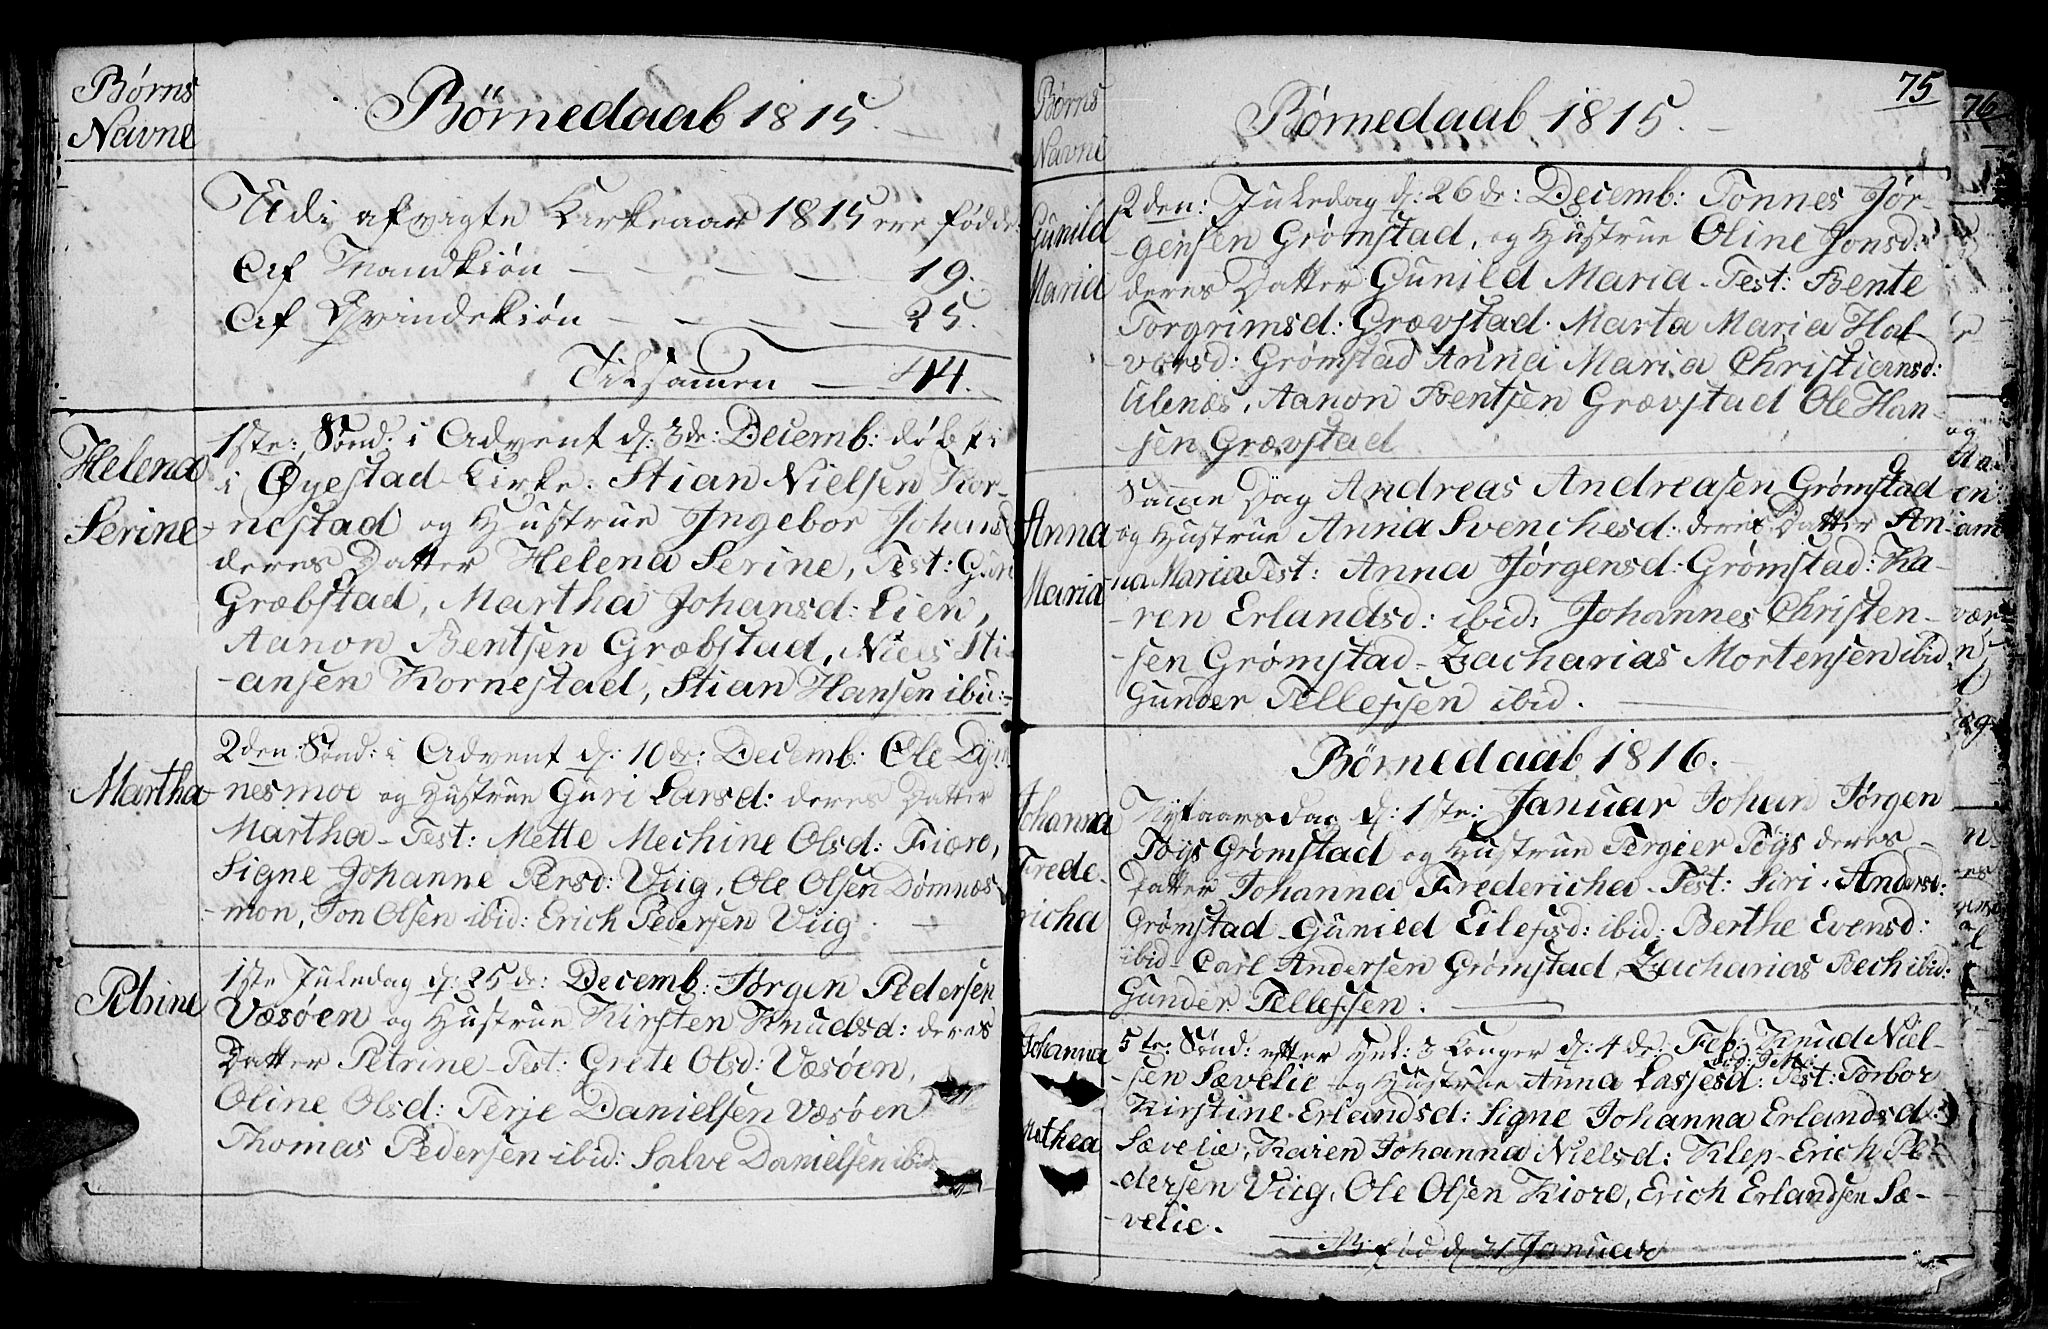 SAK, Fjære sokneprestkontor, F/Fb/L0006: Klokkerbok nr. B 6, 1803-1817, s. 75